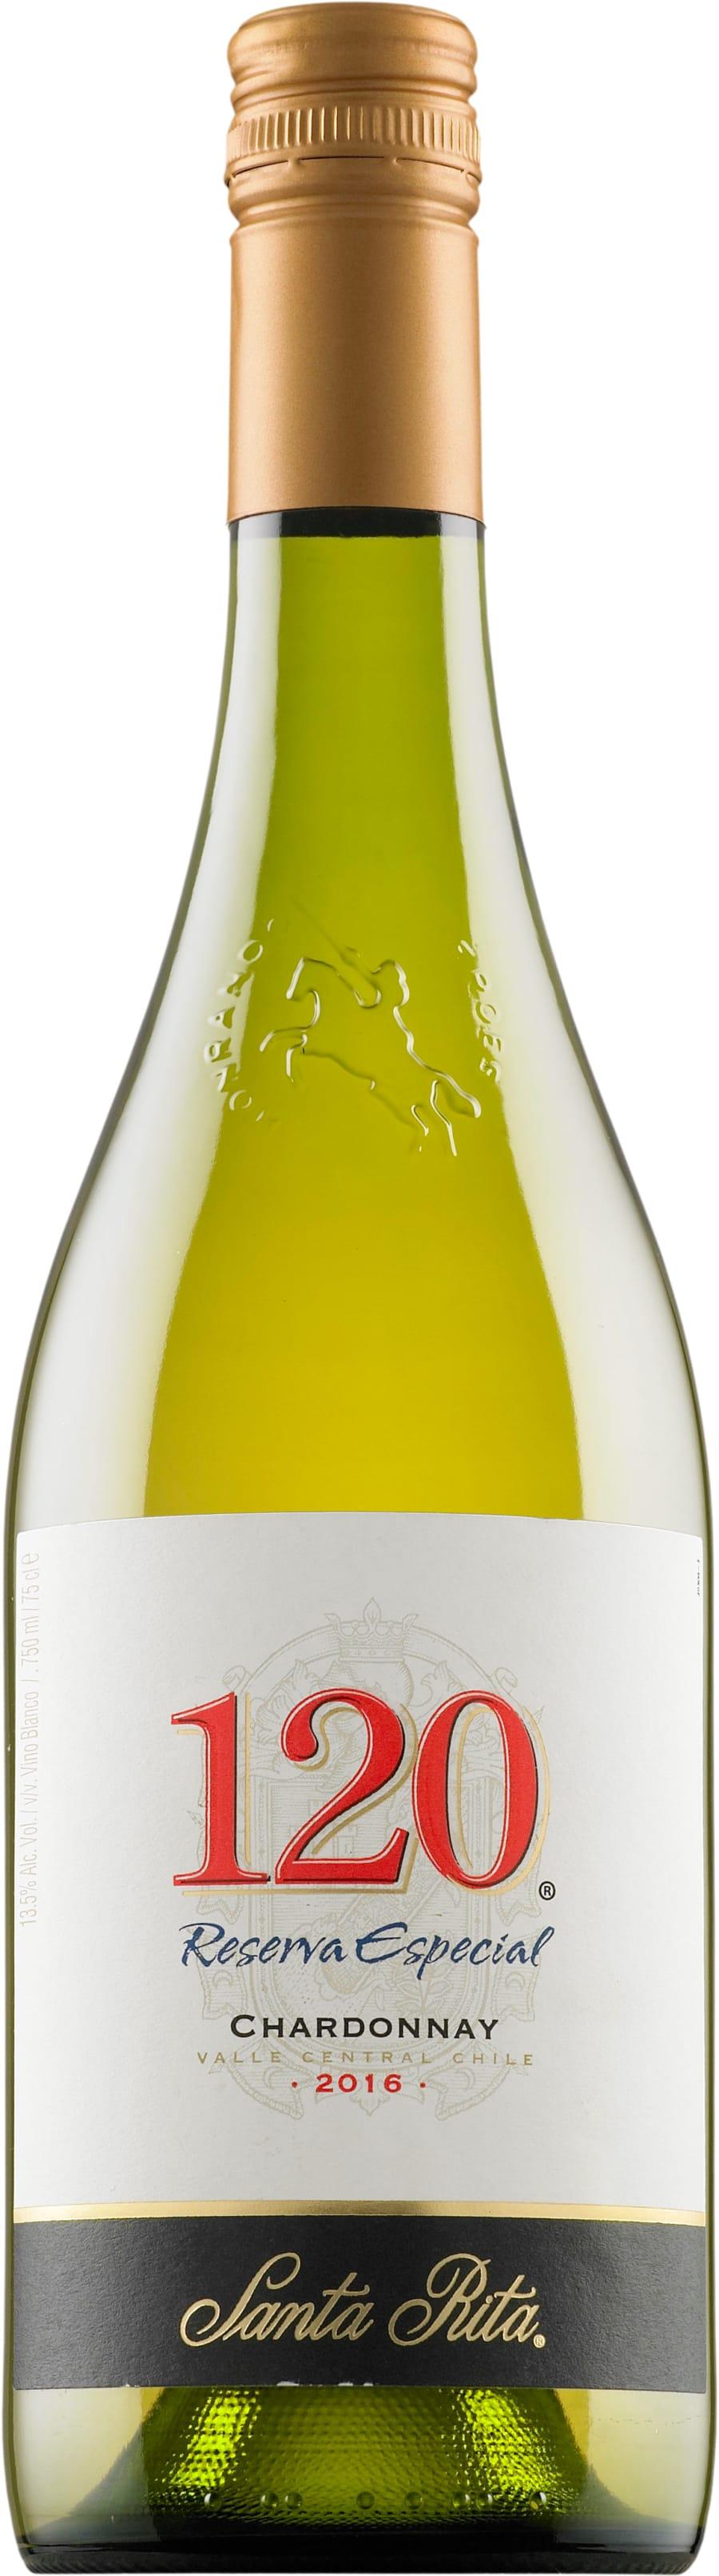 Santa Rita 120 Chardonnay 2018 Alko